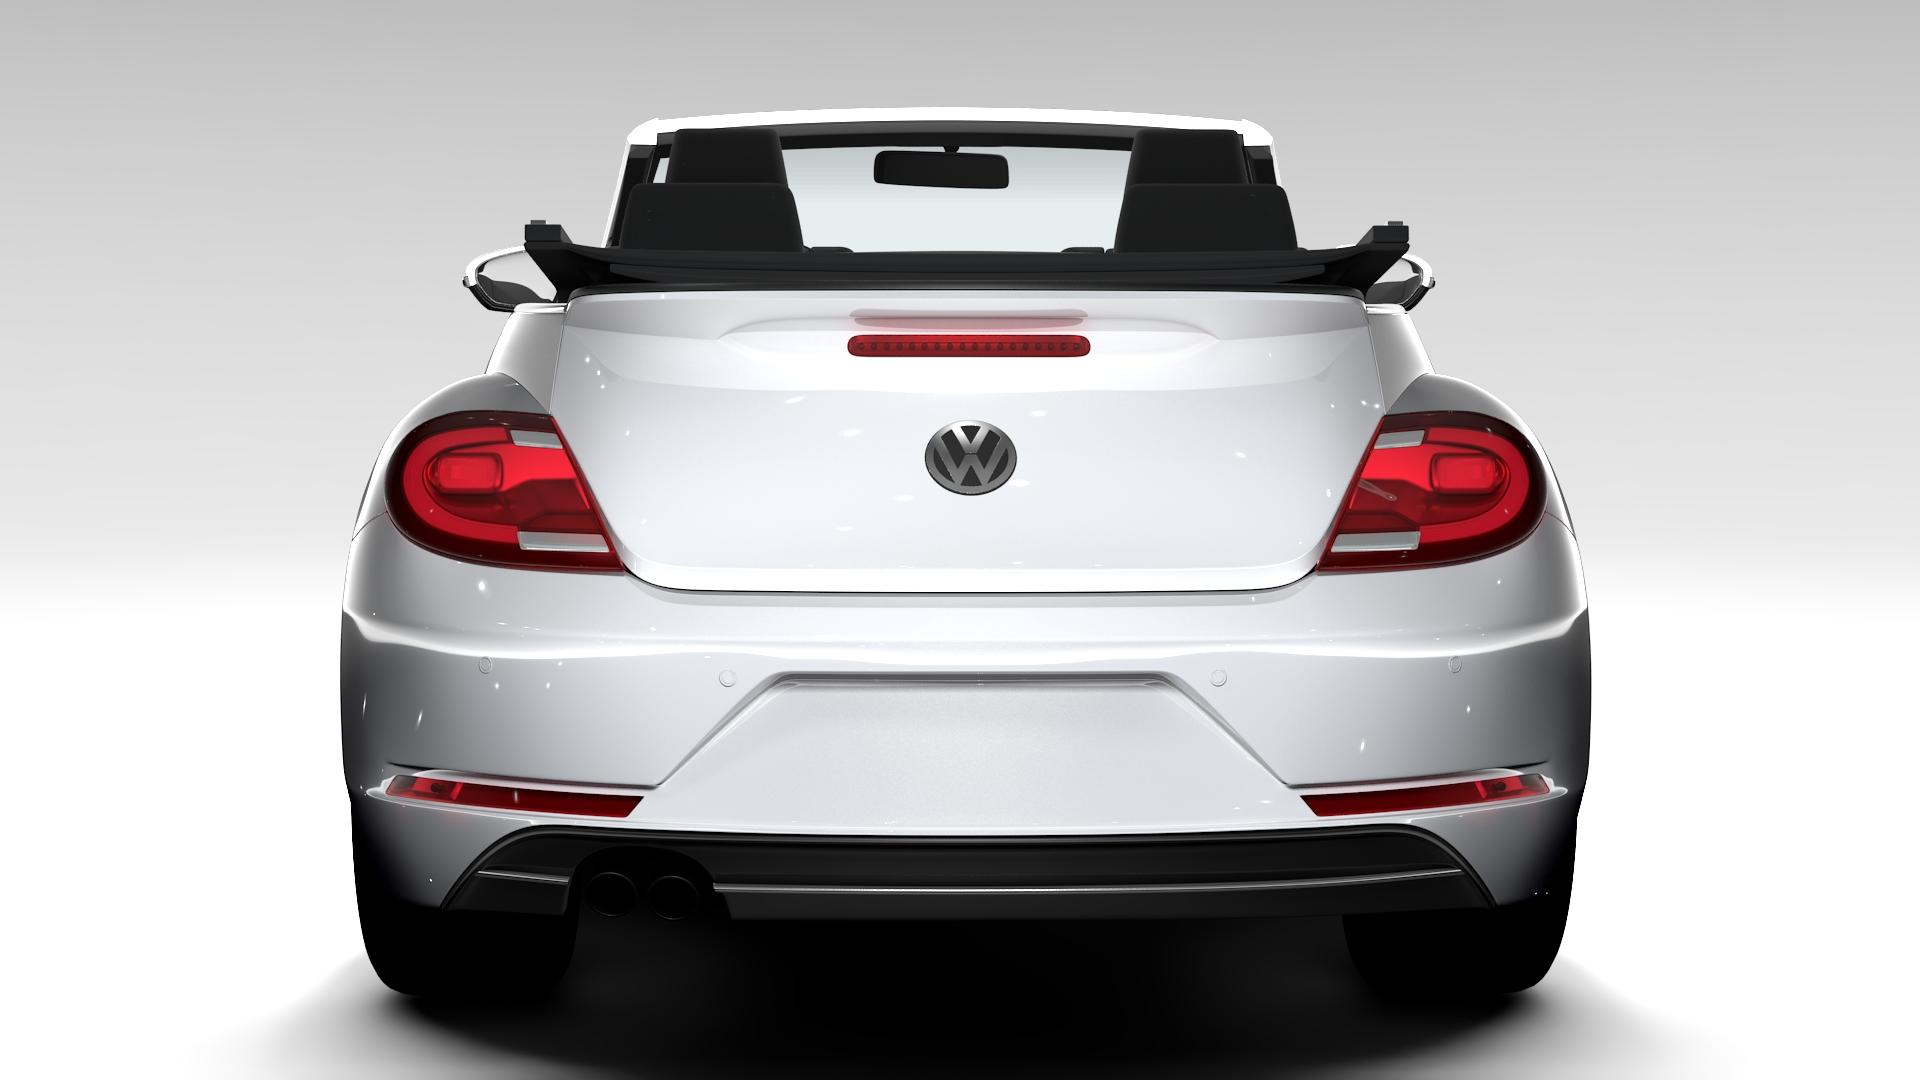 vw beetle cabriolet 2017 3d model 3ds max fbx c4d lwo ma mb hrc xsi obj 221593